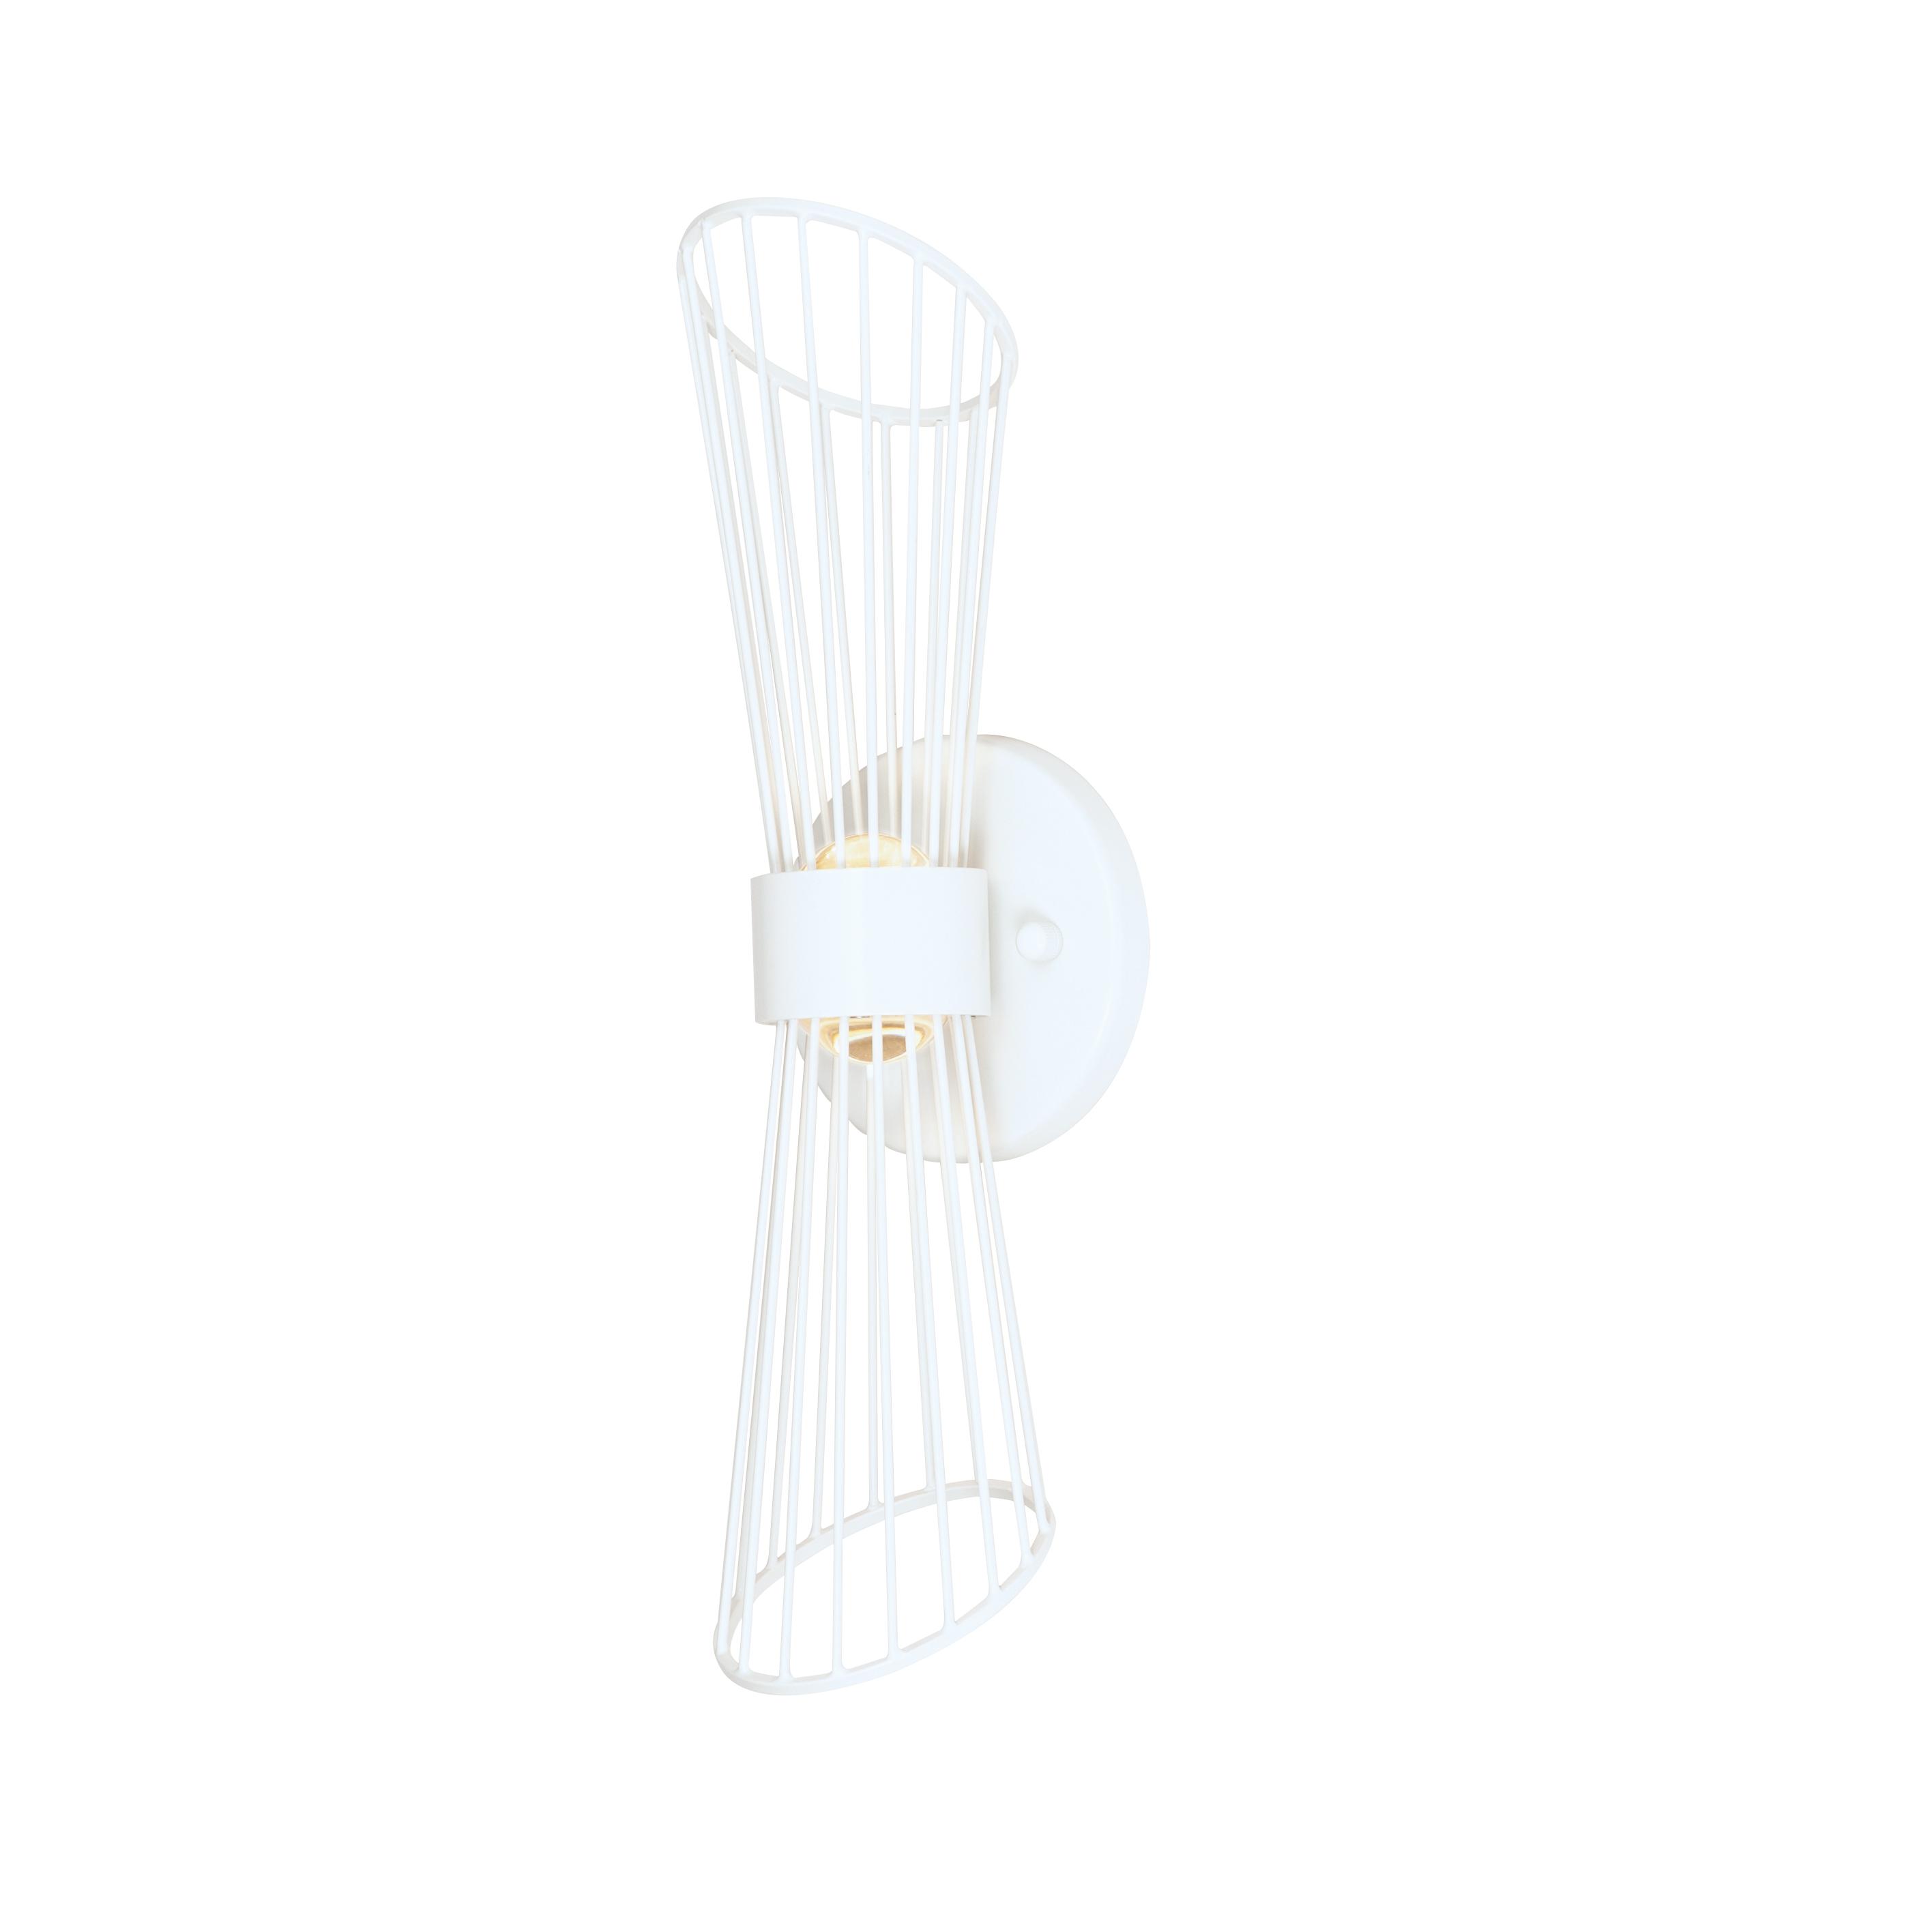 Zeta LED Wall Sconce | Maxim Lighting